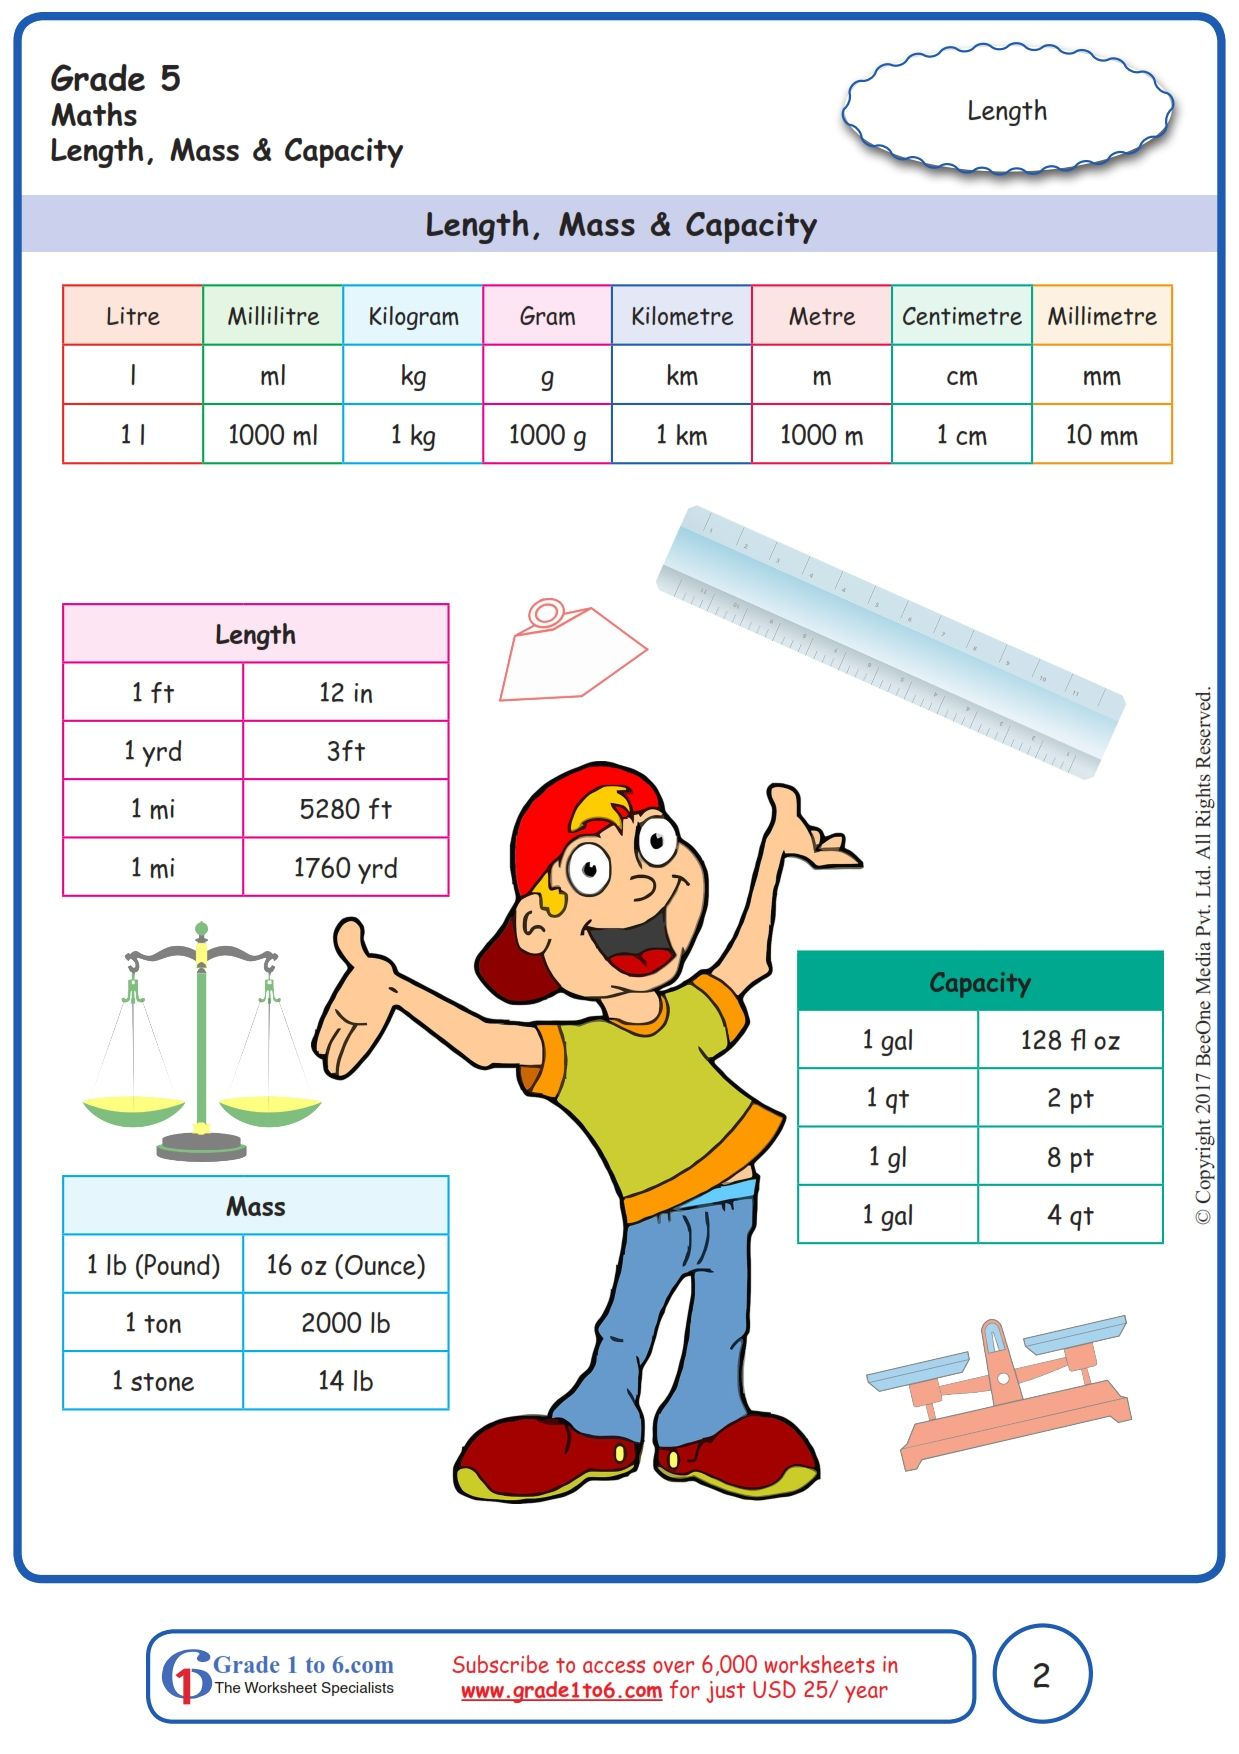 Worksheet Grade 5 Math Length Mass Capacity Free Math Worksheets Math Grade 5 Math Worksheets